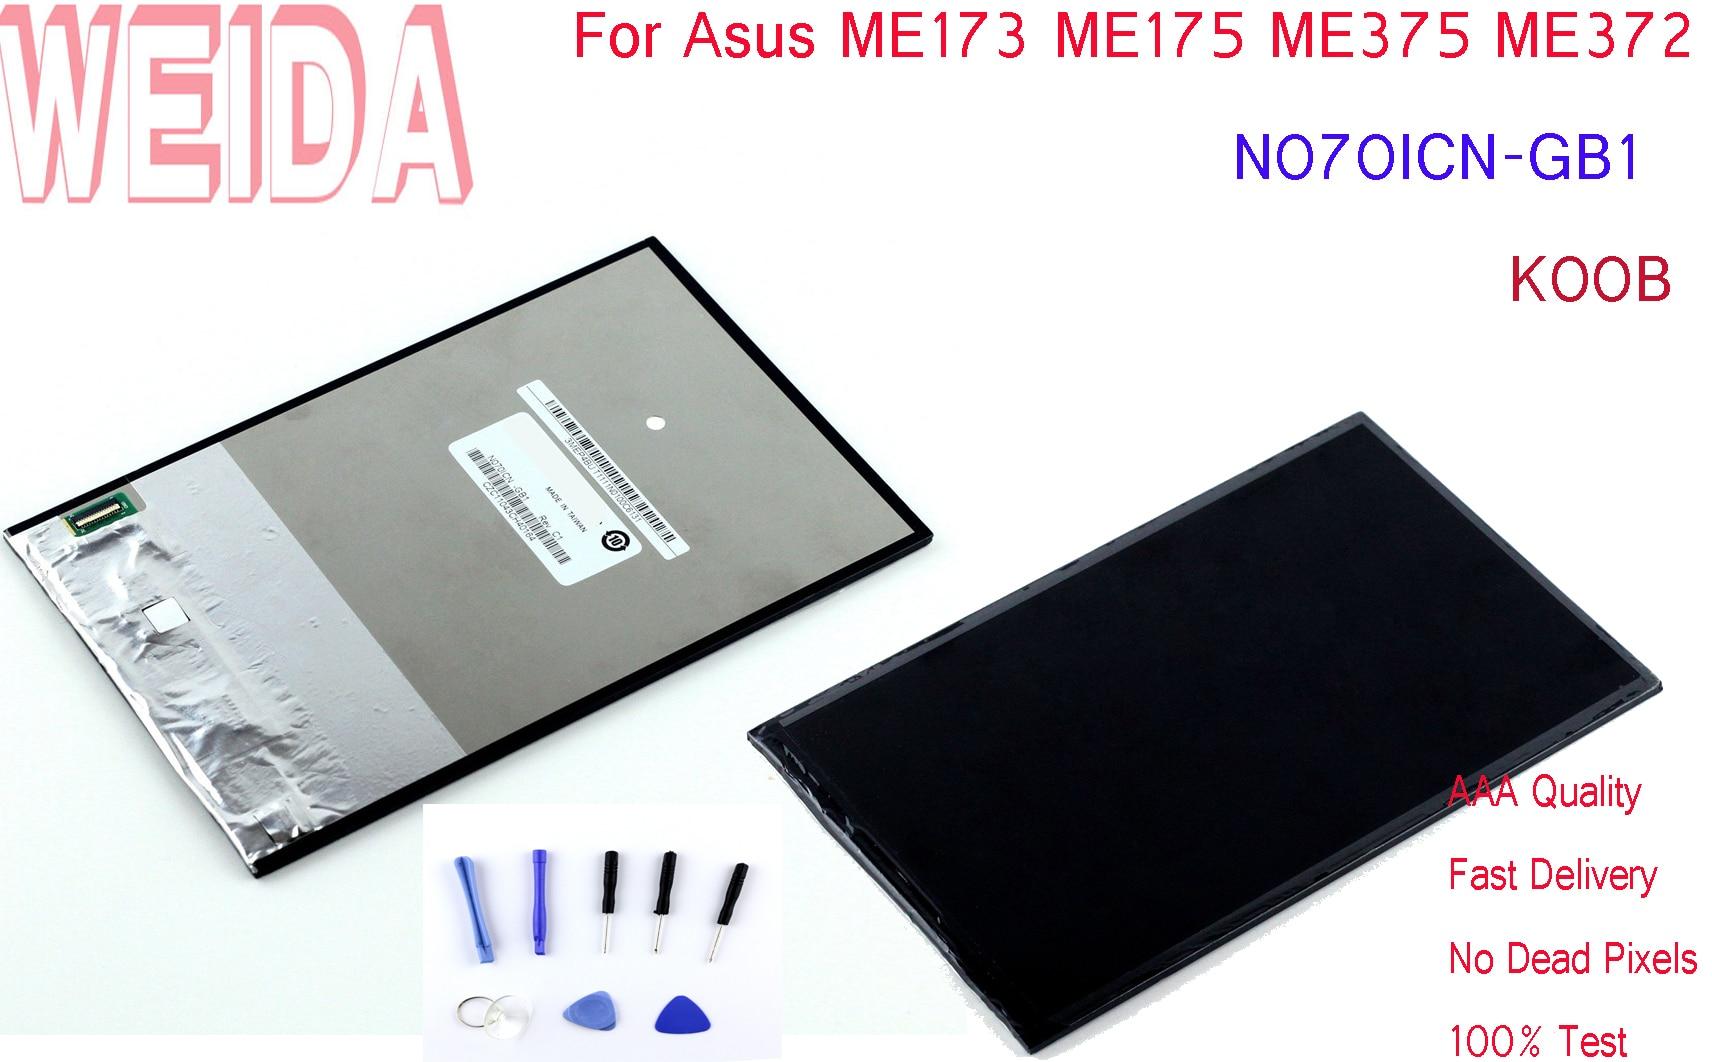 WEIDA N070ICN-GB1 LCD Display Replacement Parts For Asus ME173 ME175 ME375 ME372 /ME173 K00B 1280*800